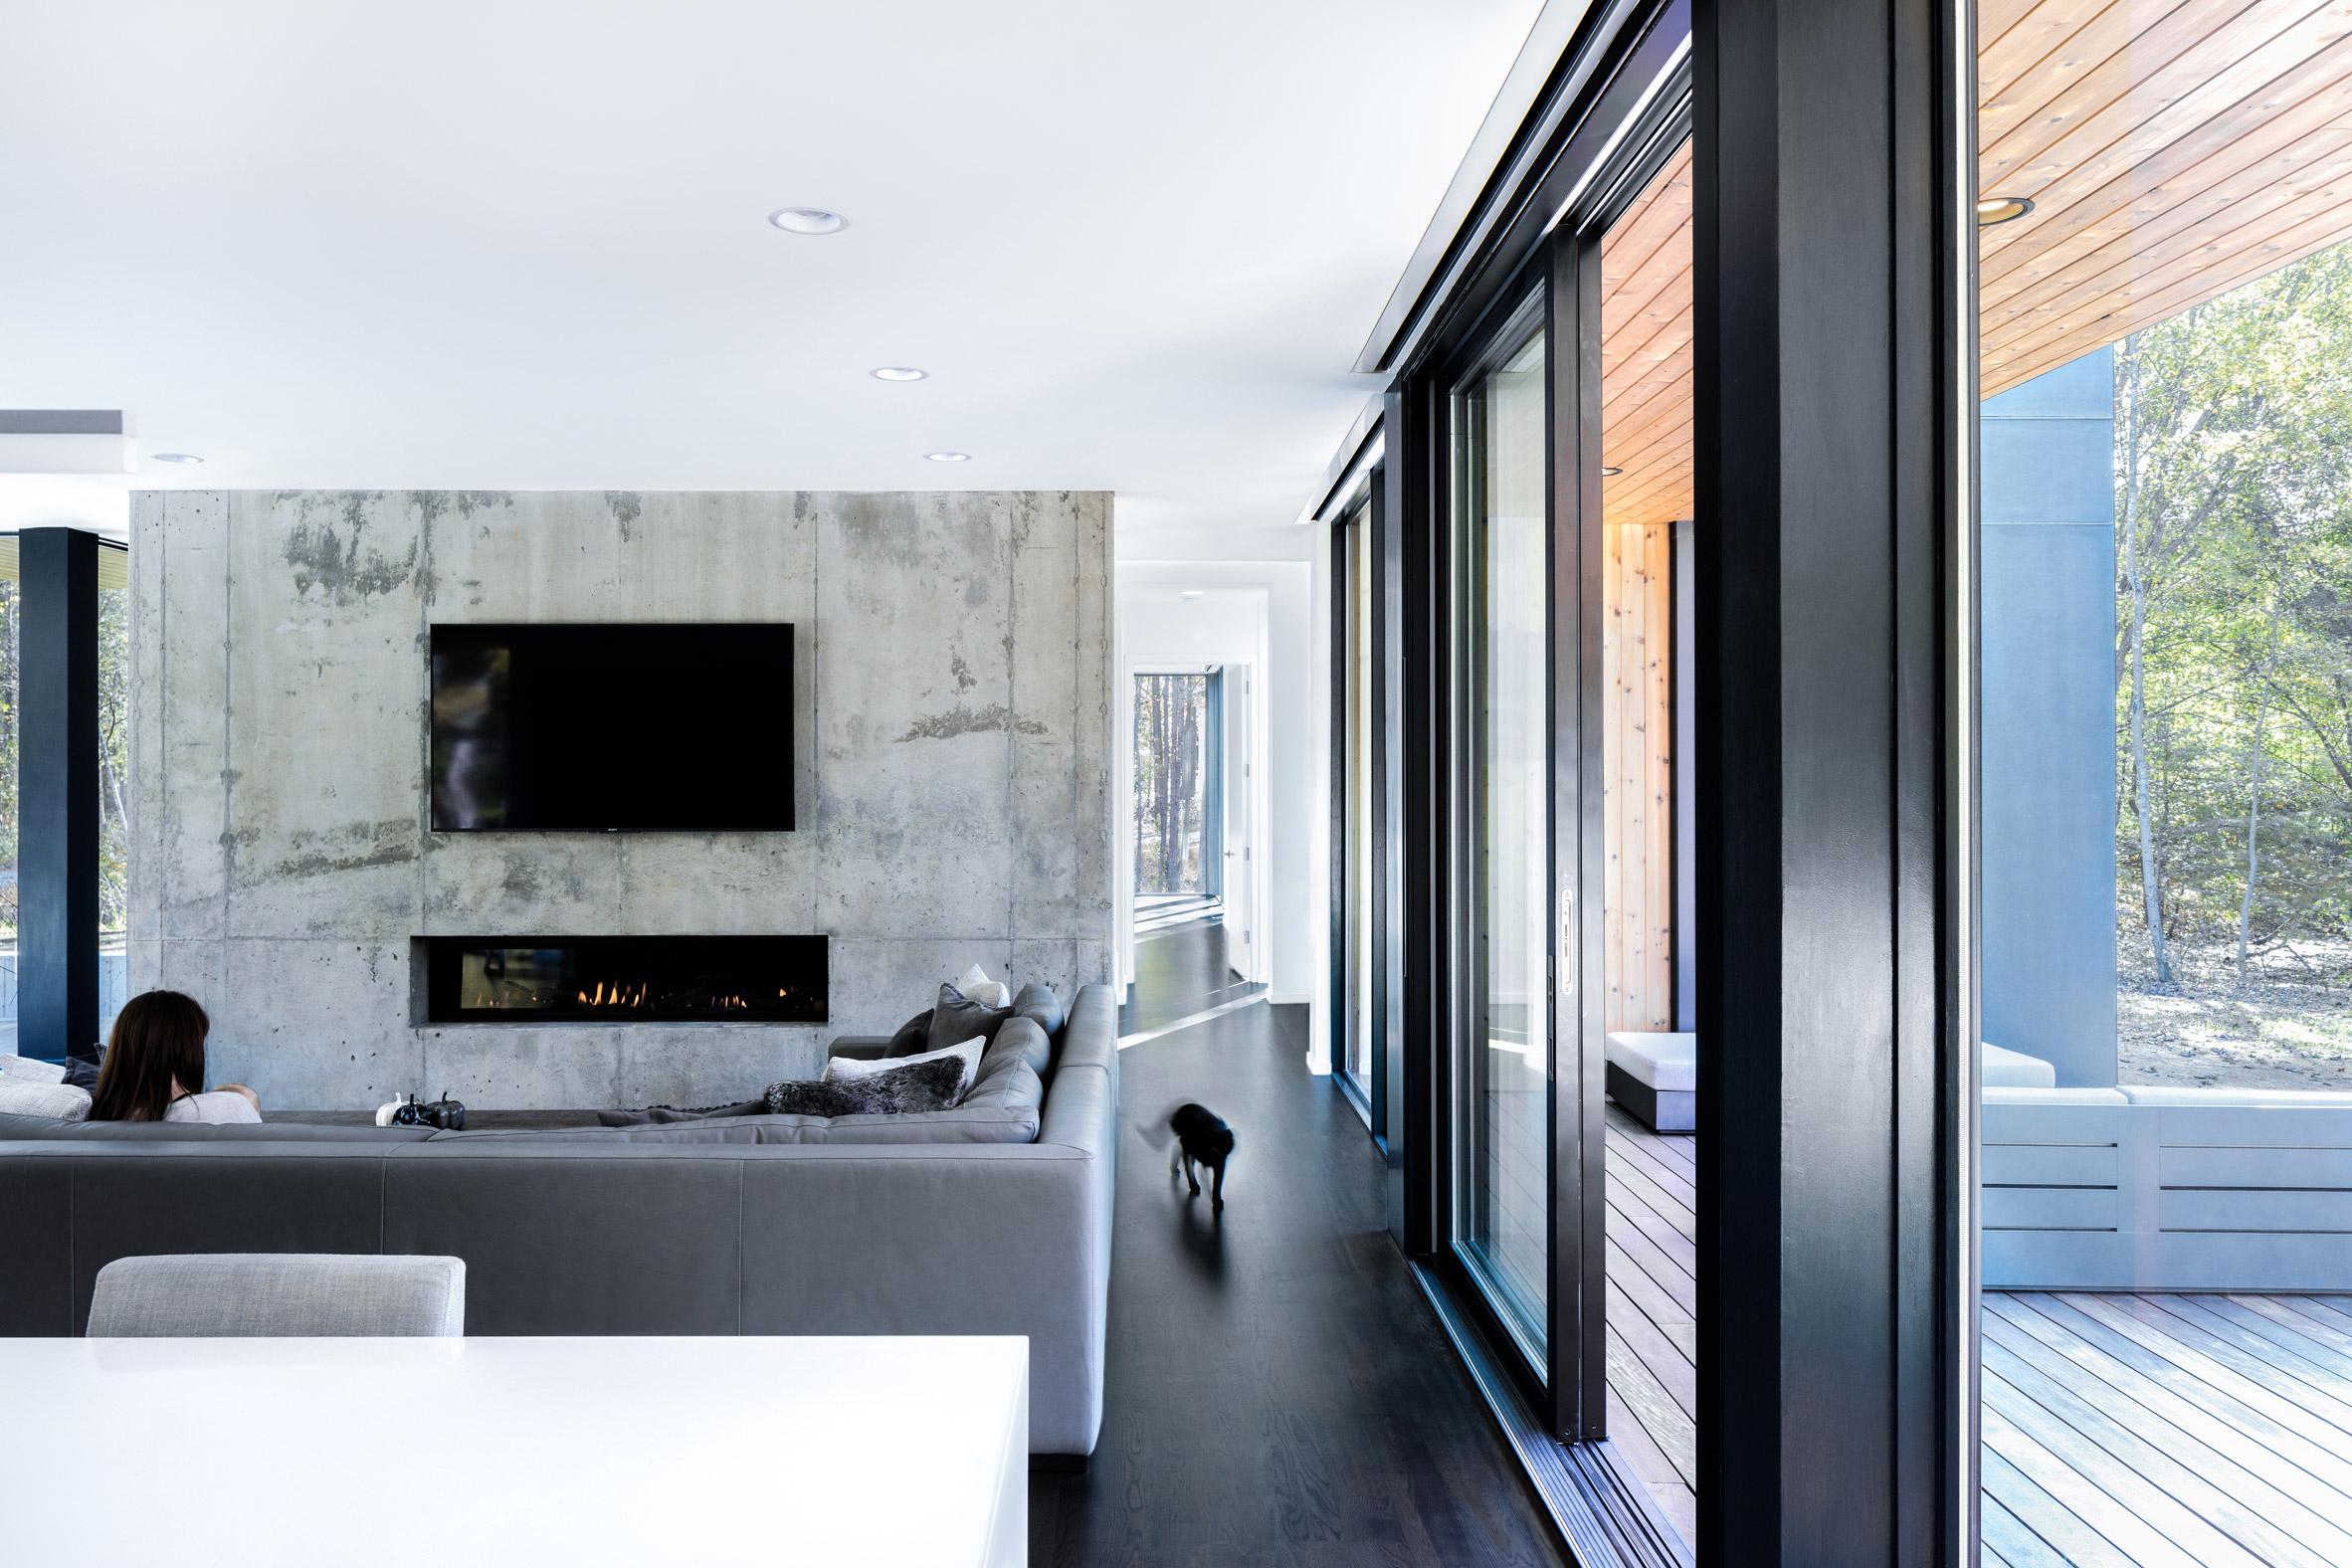 Taylor Residence by In Situ Studio